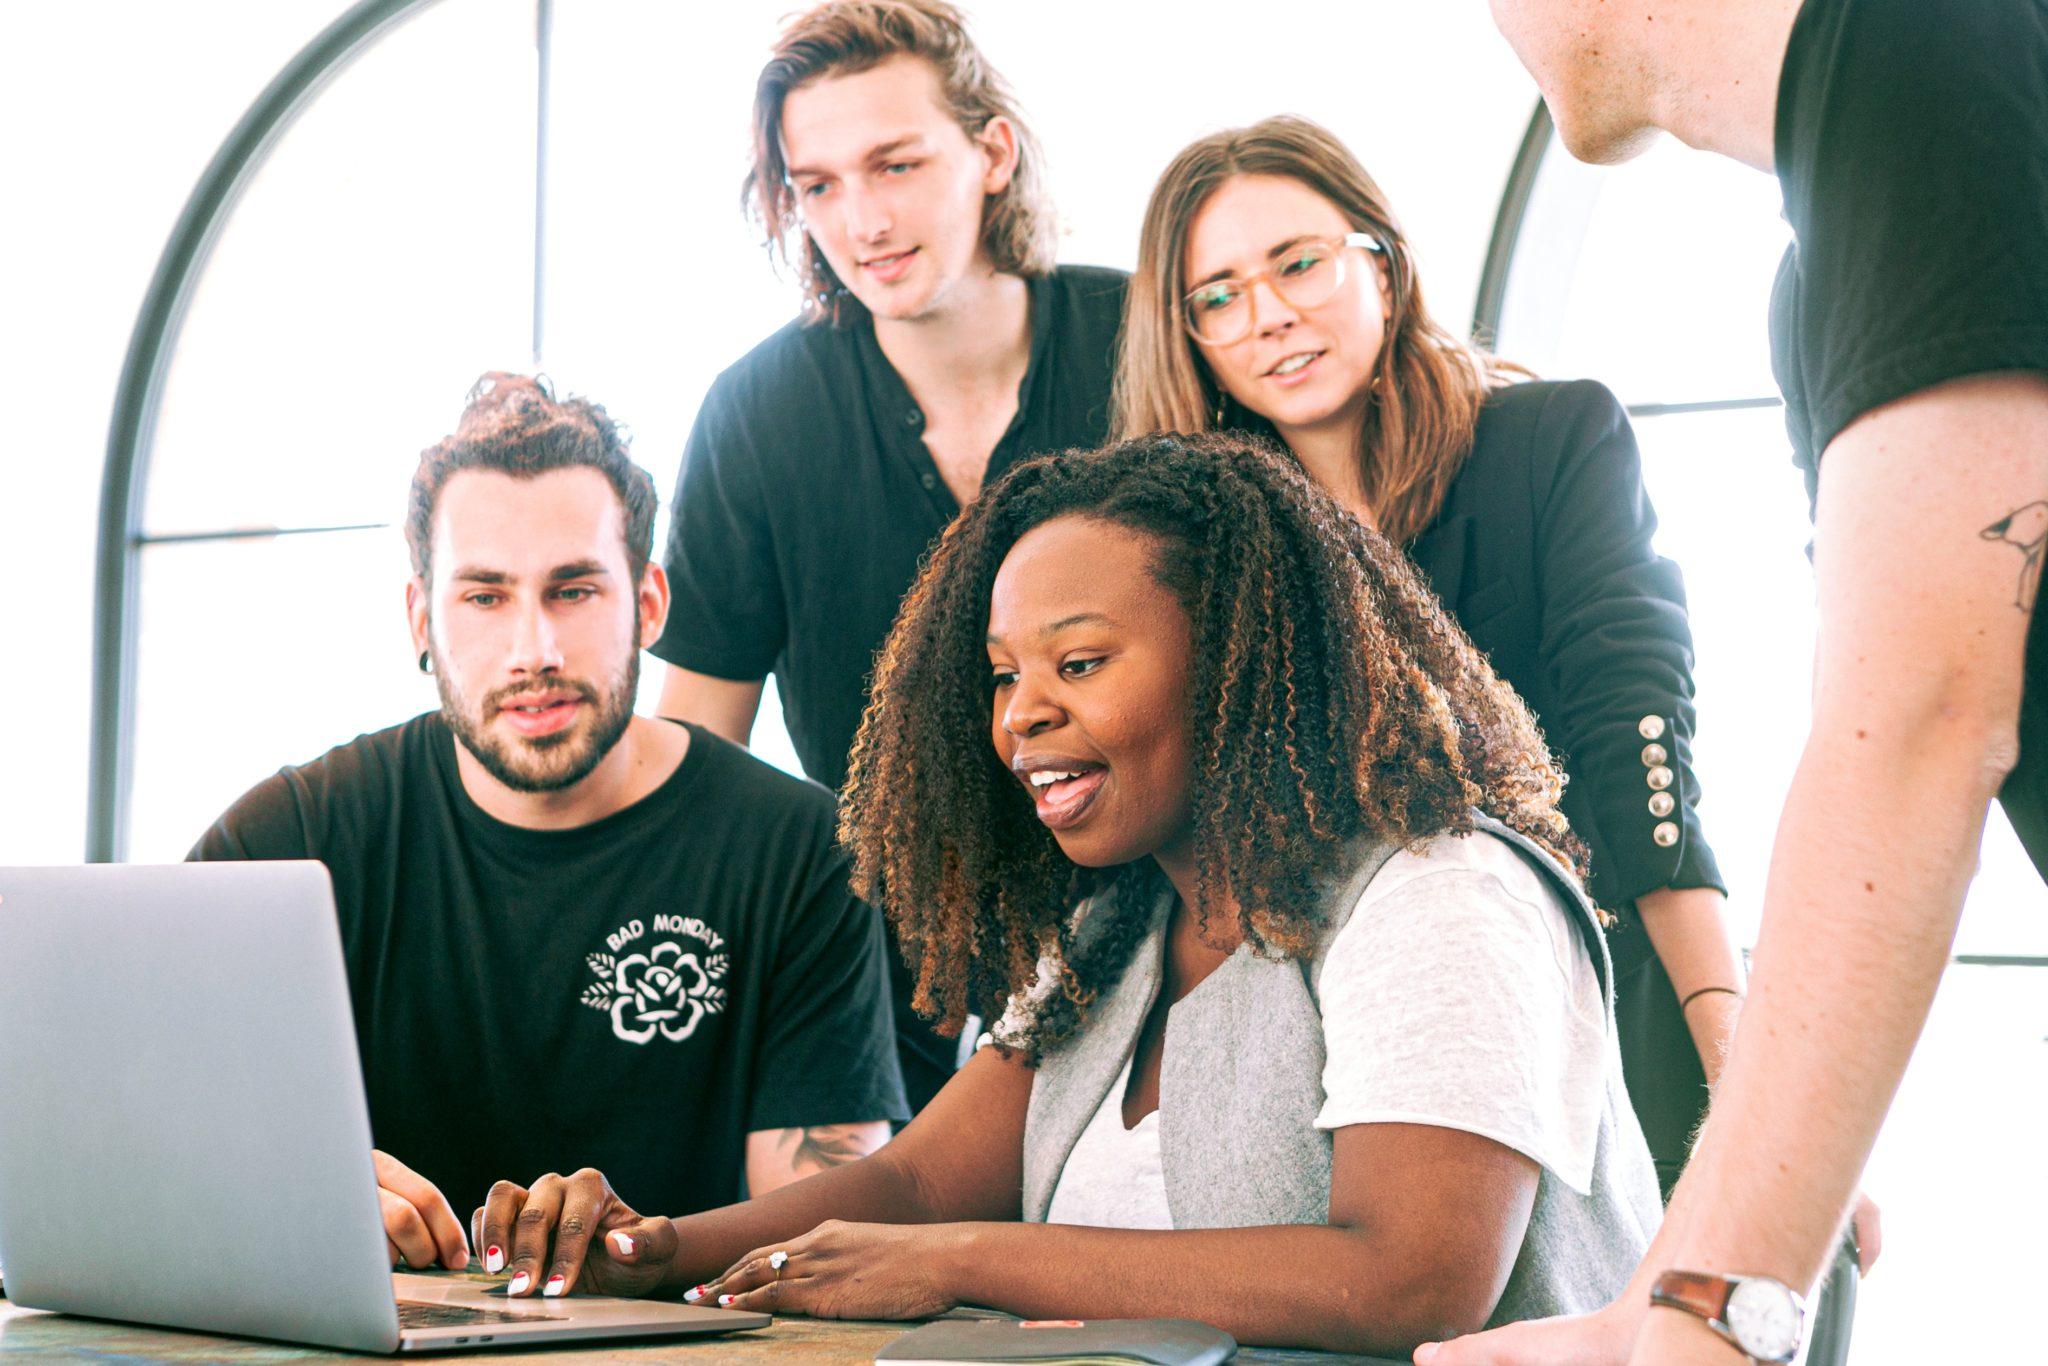 Freelance News, Freelancing Resources, Freelancing Platforms, Freelancing Marketplaces, Freelancing Websites, Freelancing Tips, Freelance Remote Work